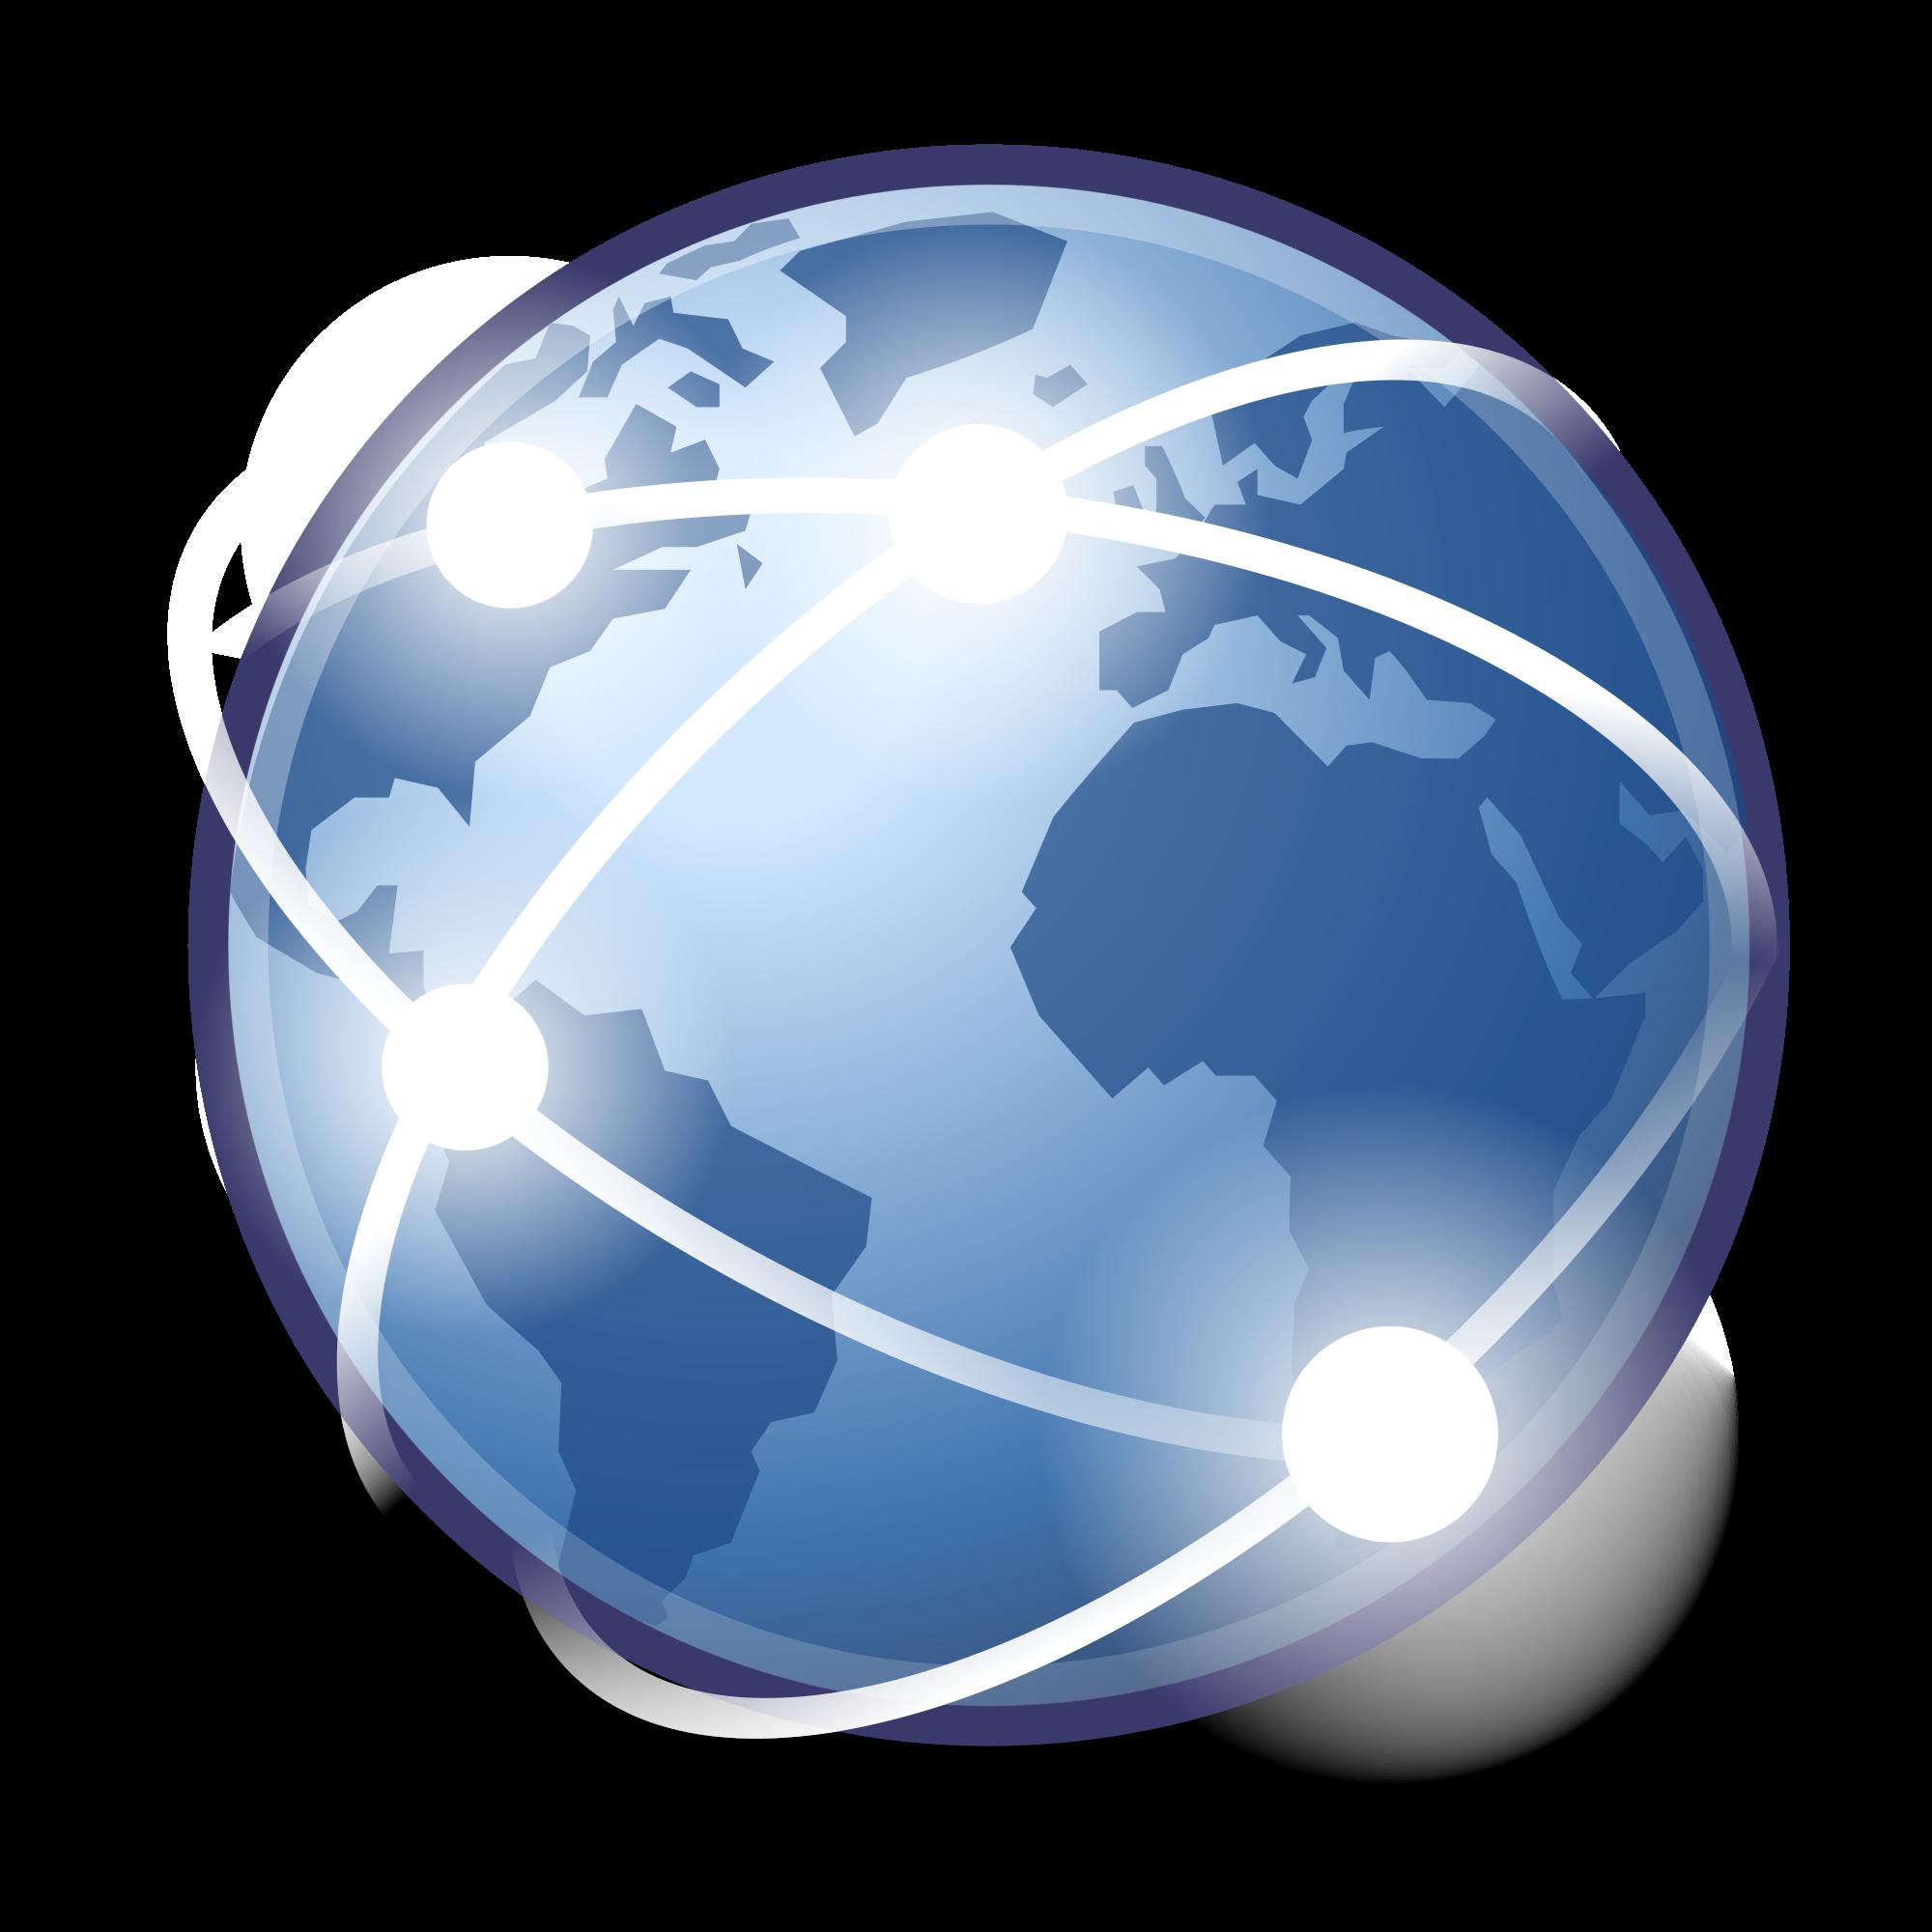 PNG Internet - 52404